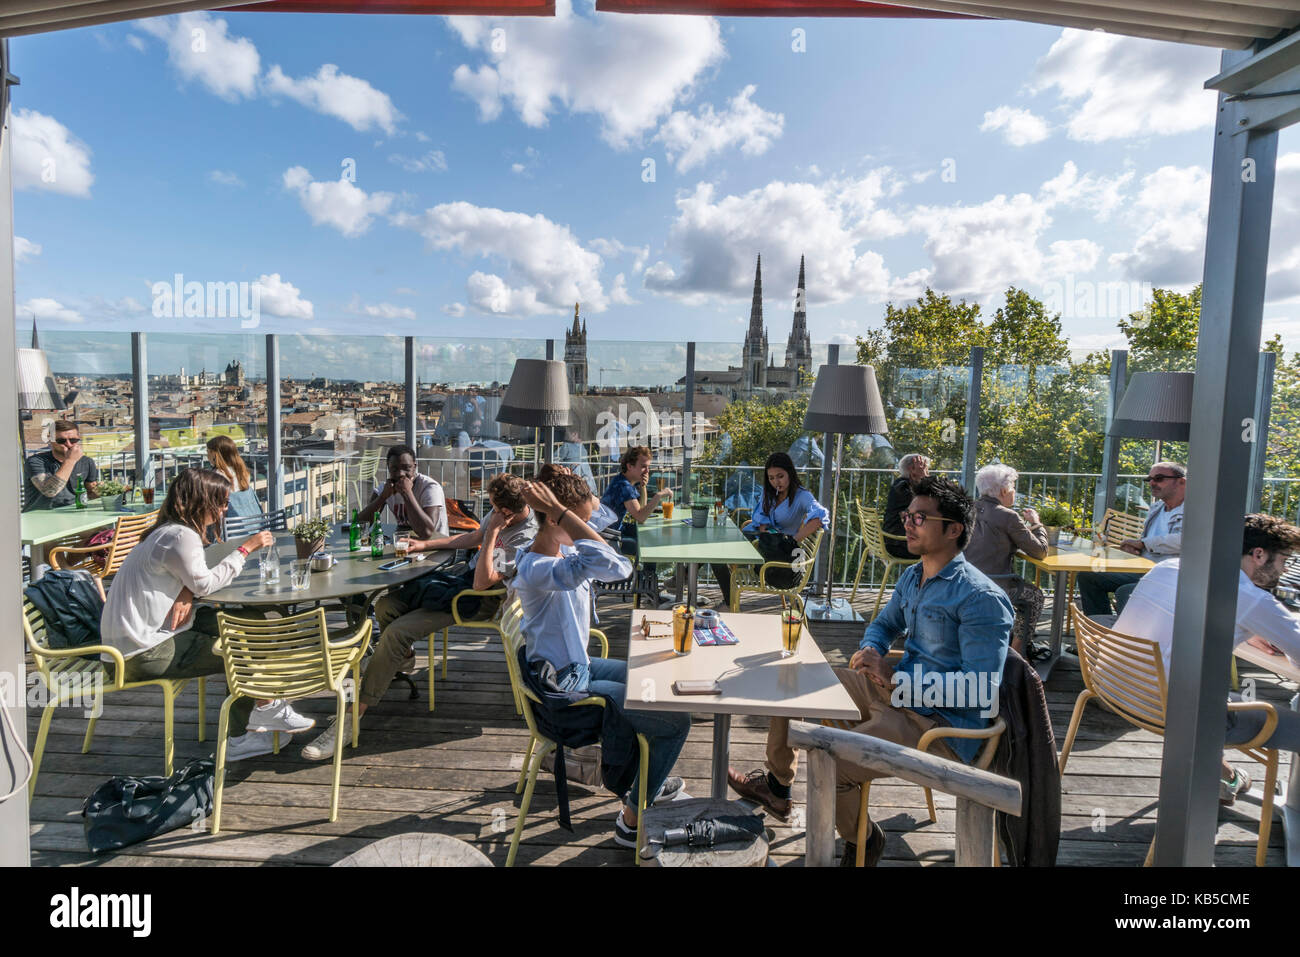 Mama shelter Design  Hotel, designed by Philipp Starck, sky bar, rooftop,  Bordeaux, France - Stock Image